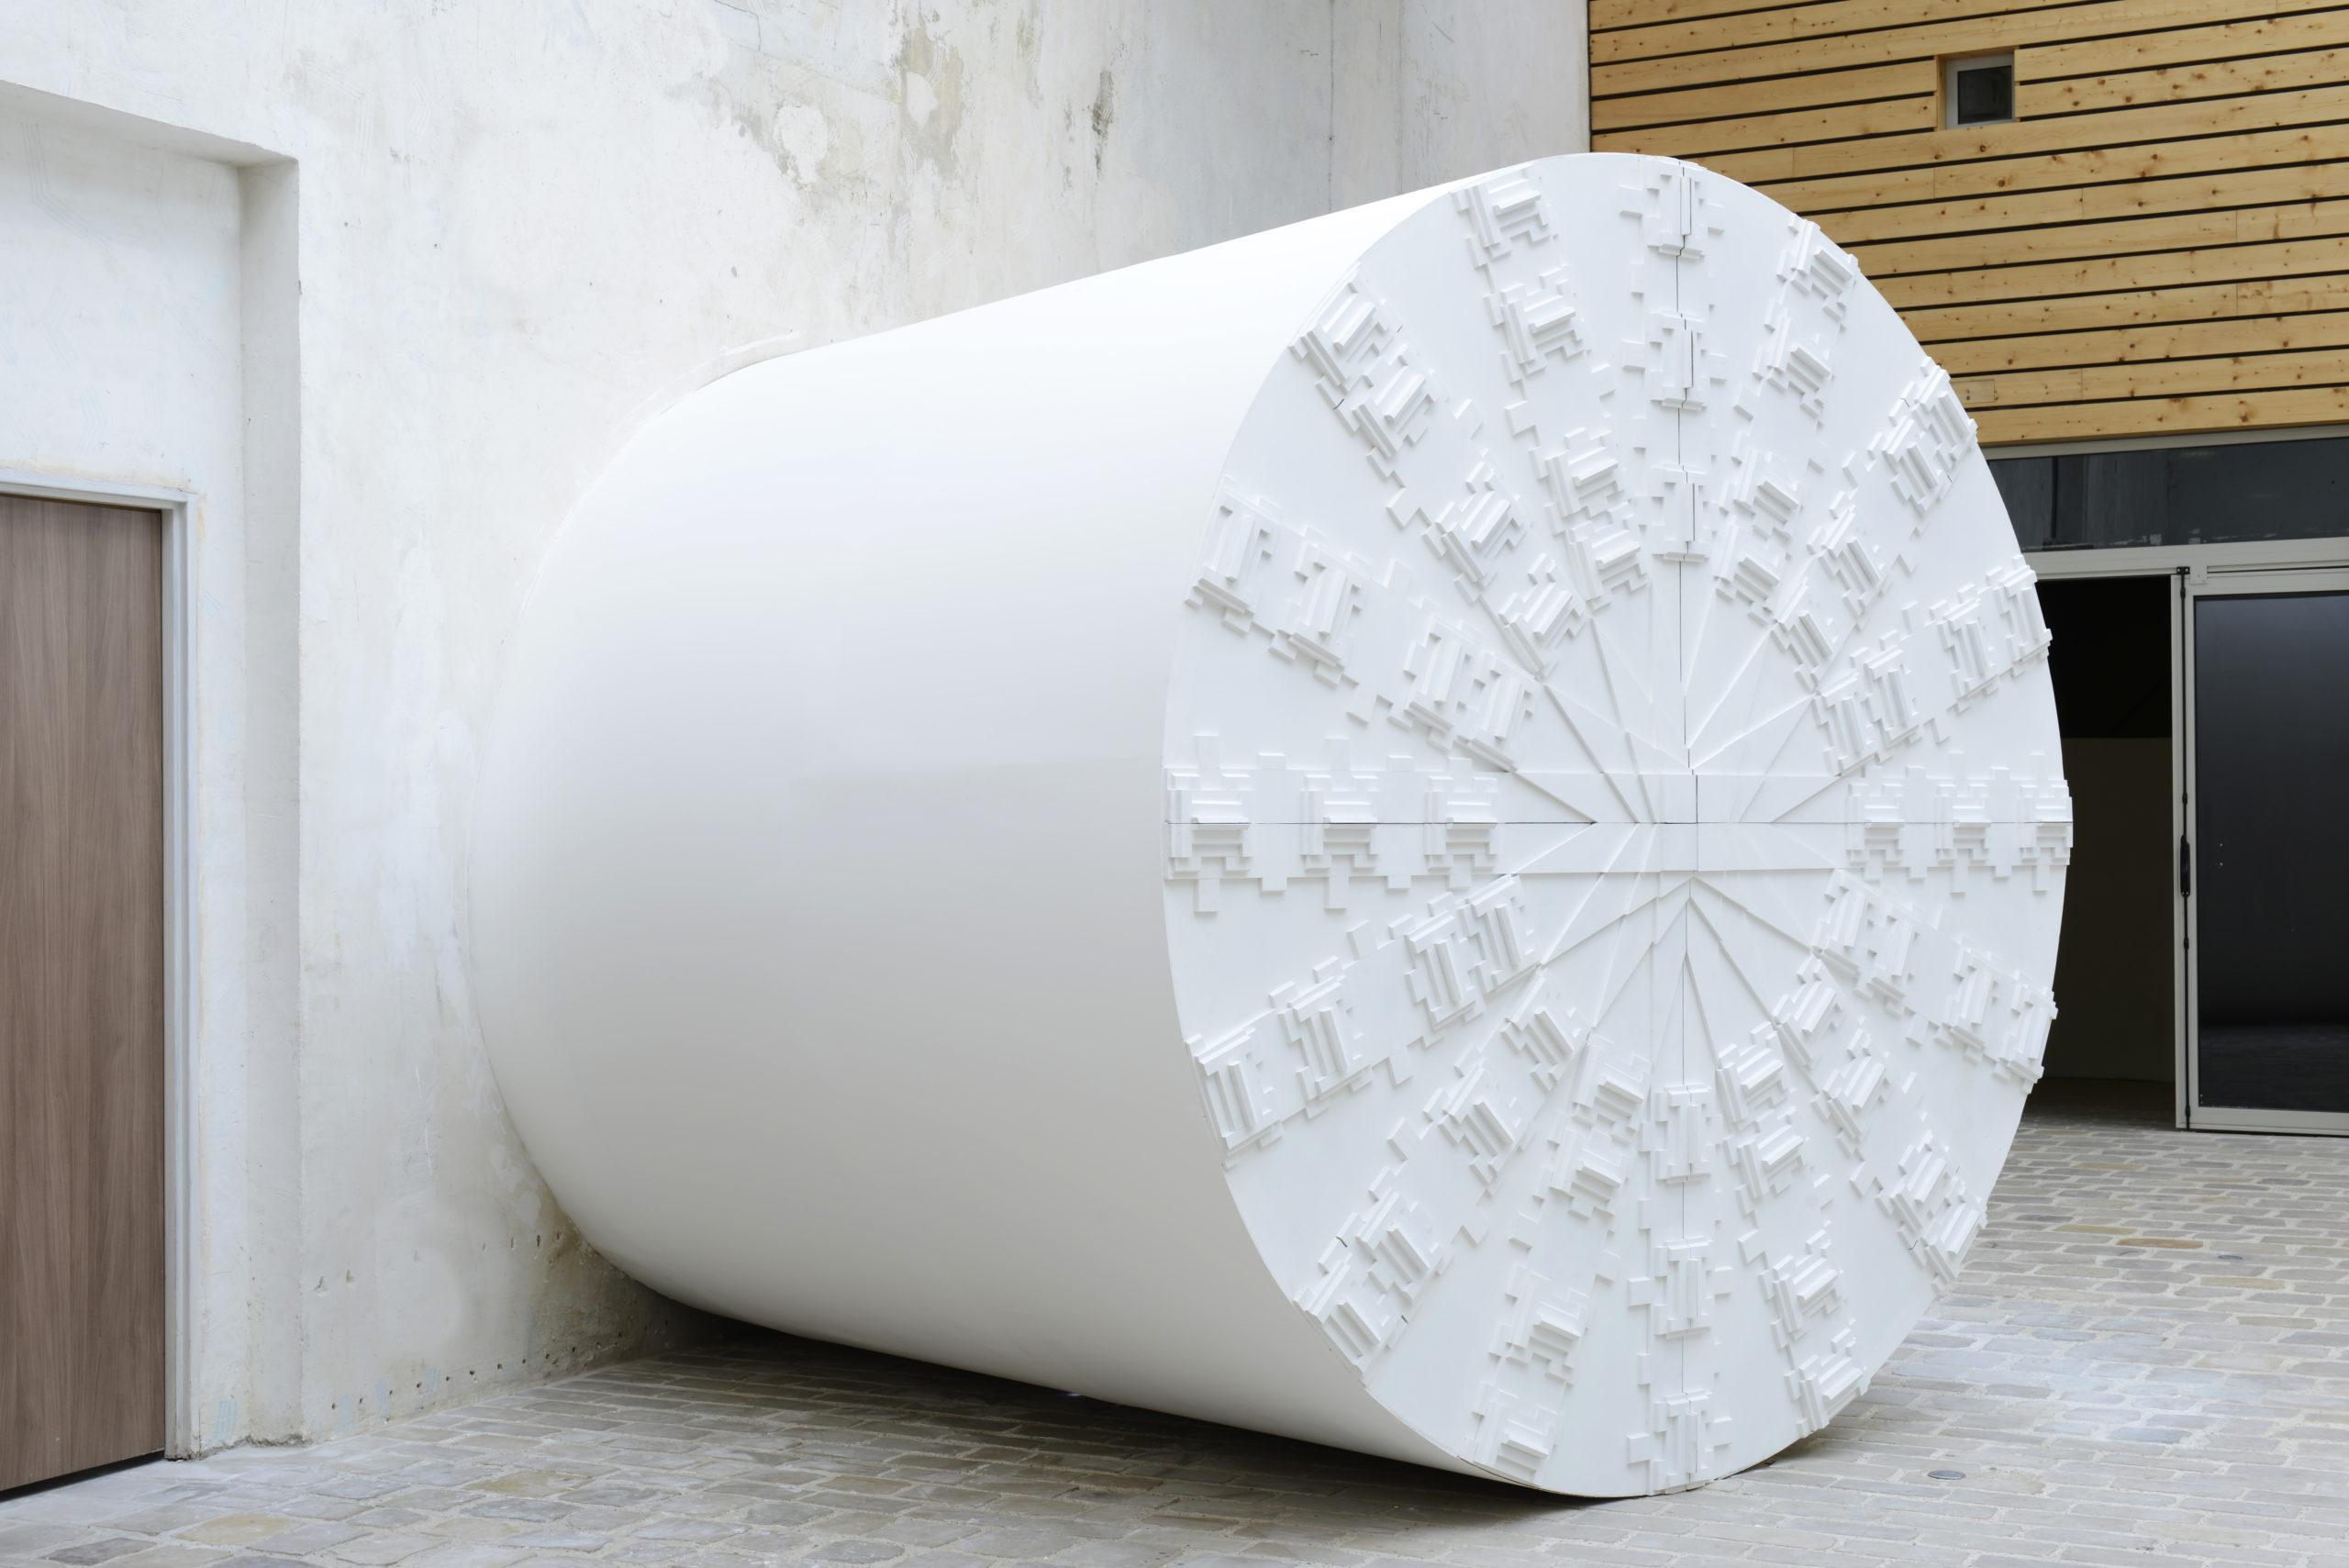 Maxime Thoreau, installation, artist, French, Glogauair, art residency, Berlin